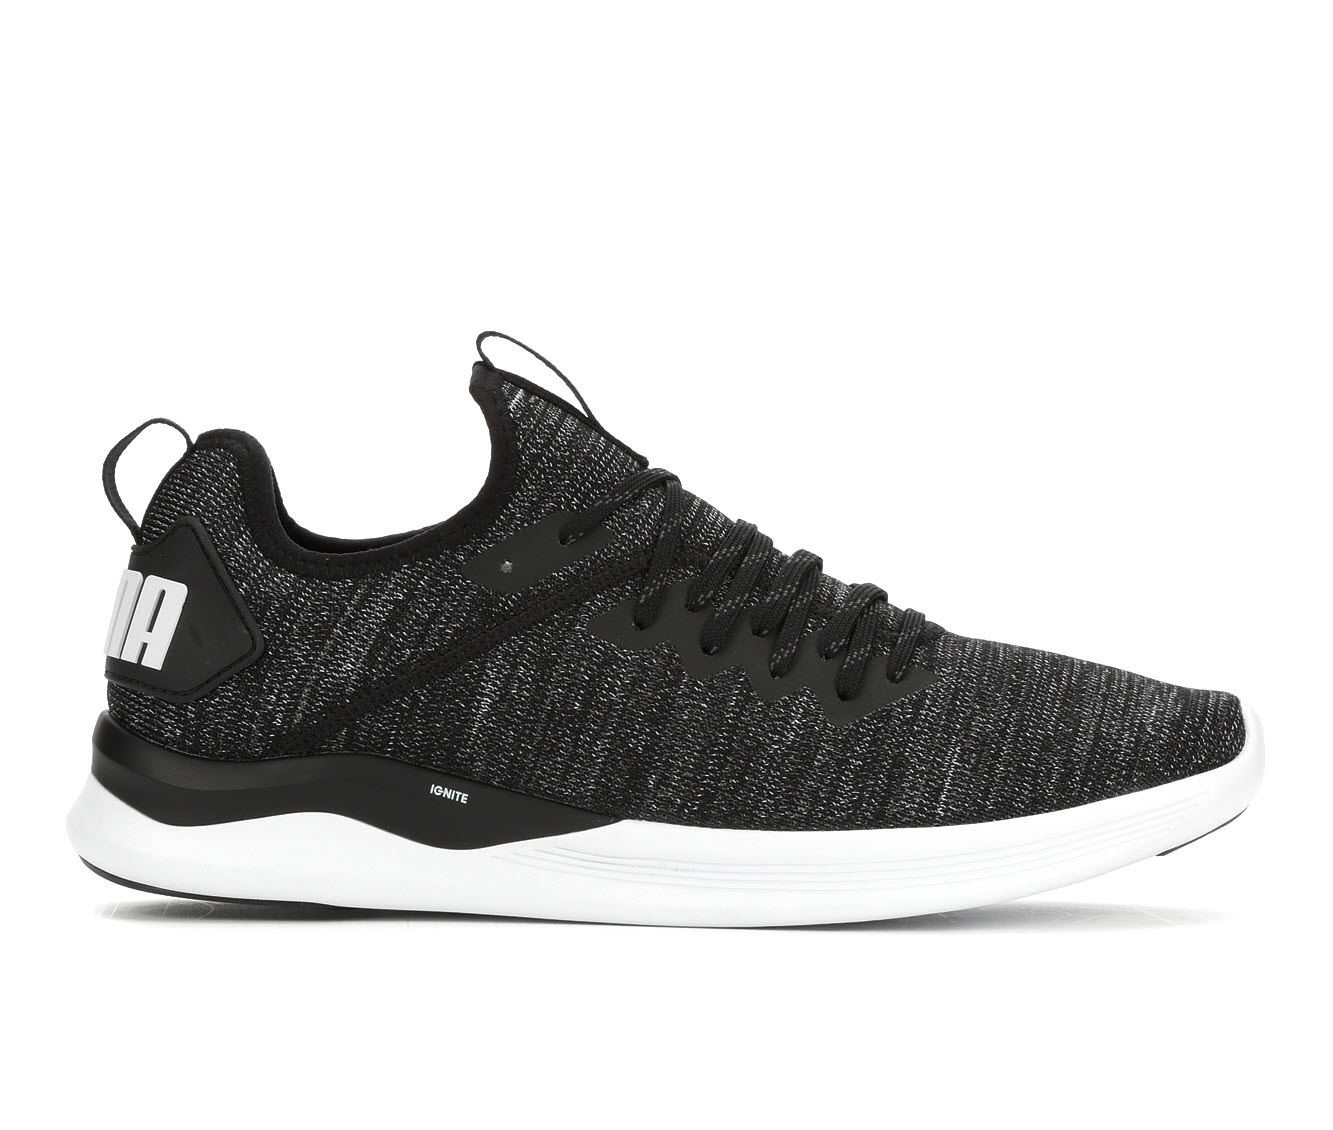 Men's Puma Ignite Flash Evoknit Sneakers (Black - Size 8) 1700590